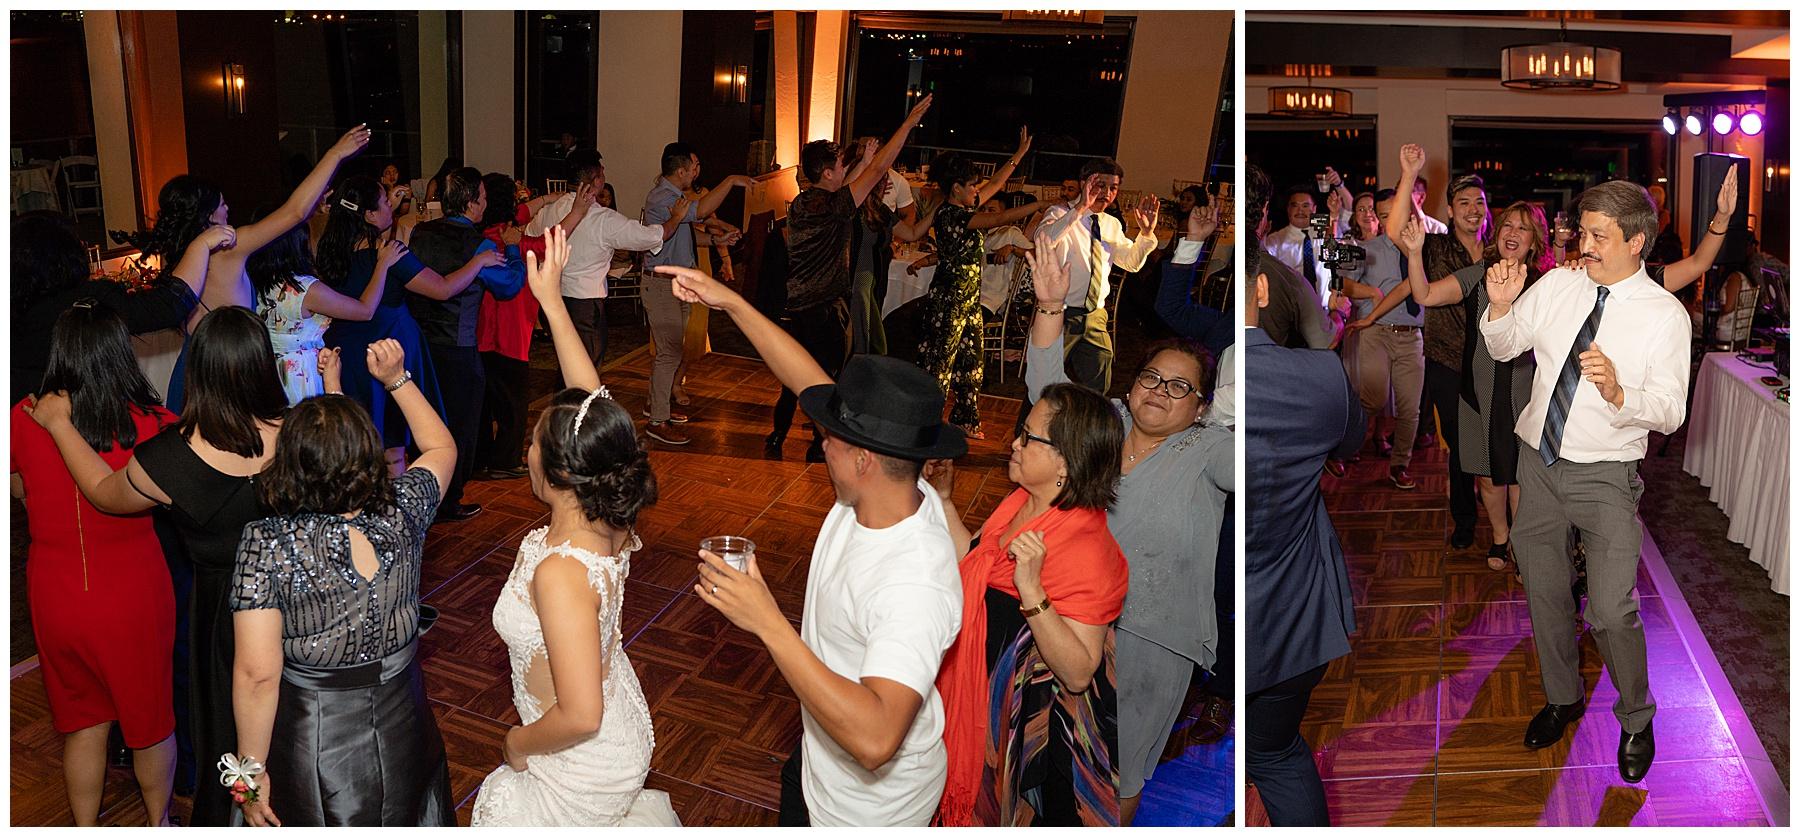 tom ham's lighthouse wedding dancing